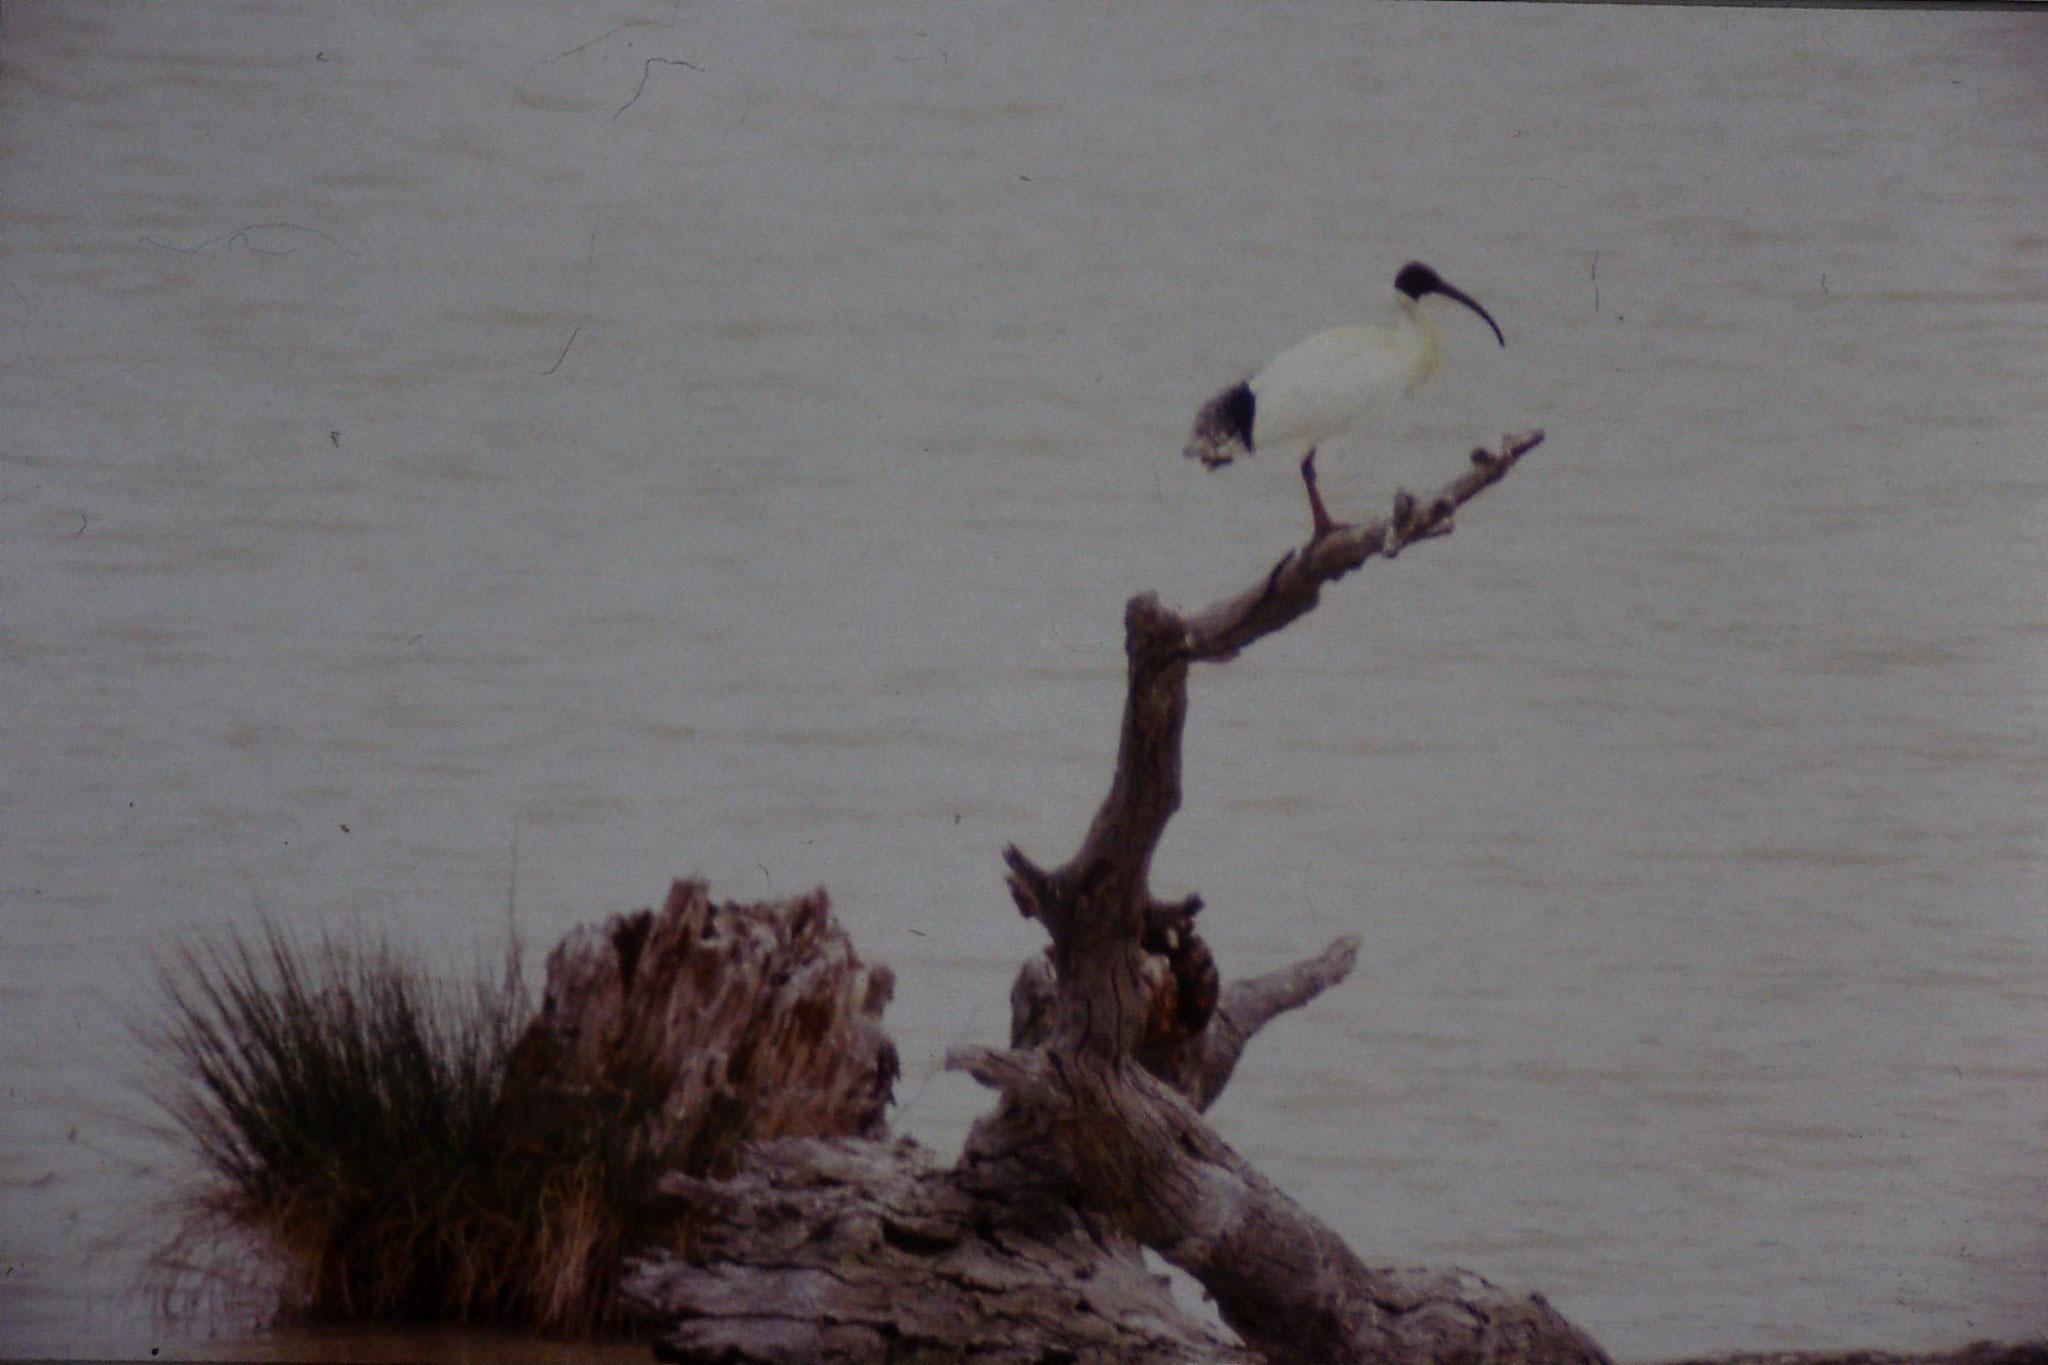 25/9/1990: 19: Kerang, ibis rookery